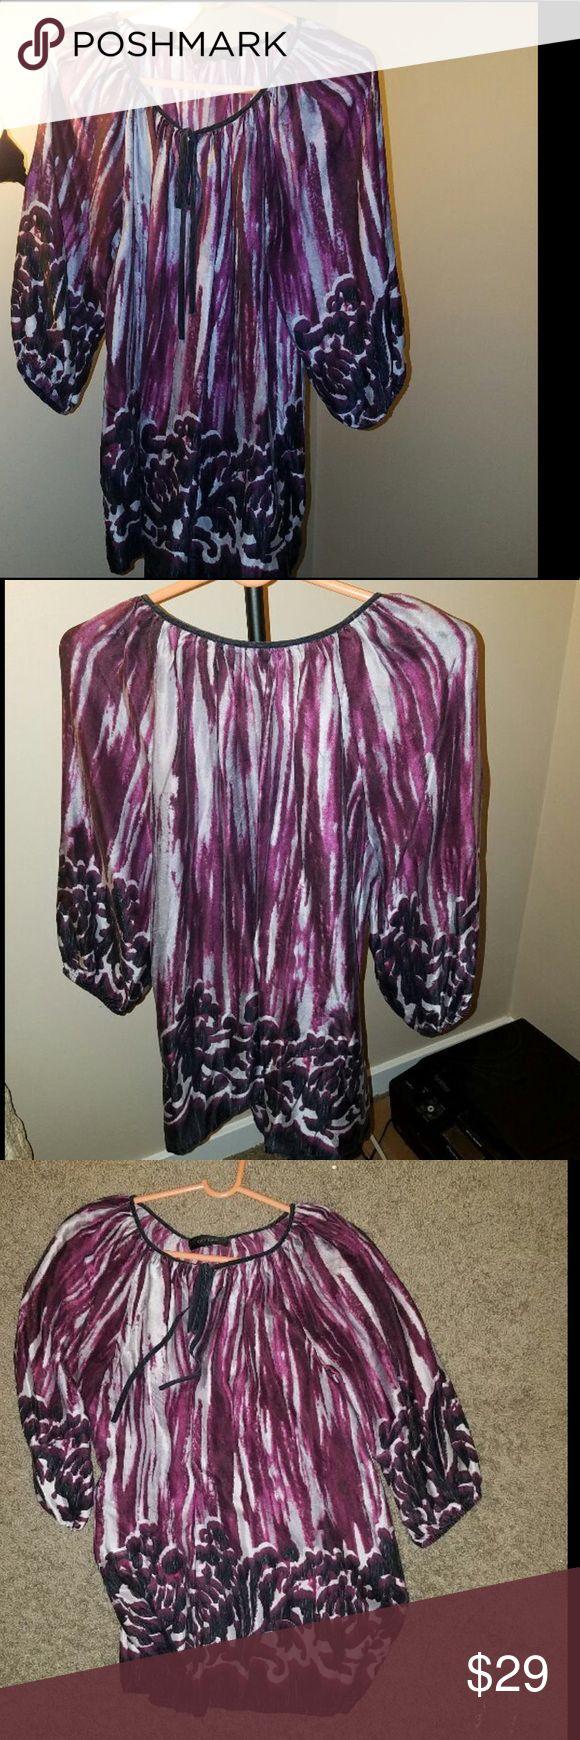 Karen Kane 100% silk blouse See photos for more details 100% silk Worn once Karen Kane Tops Blouses